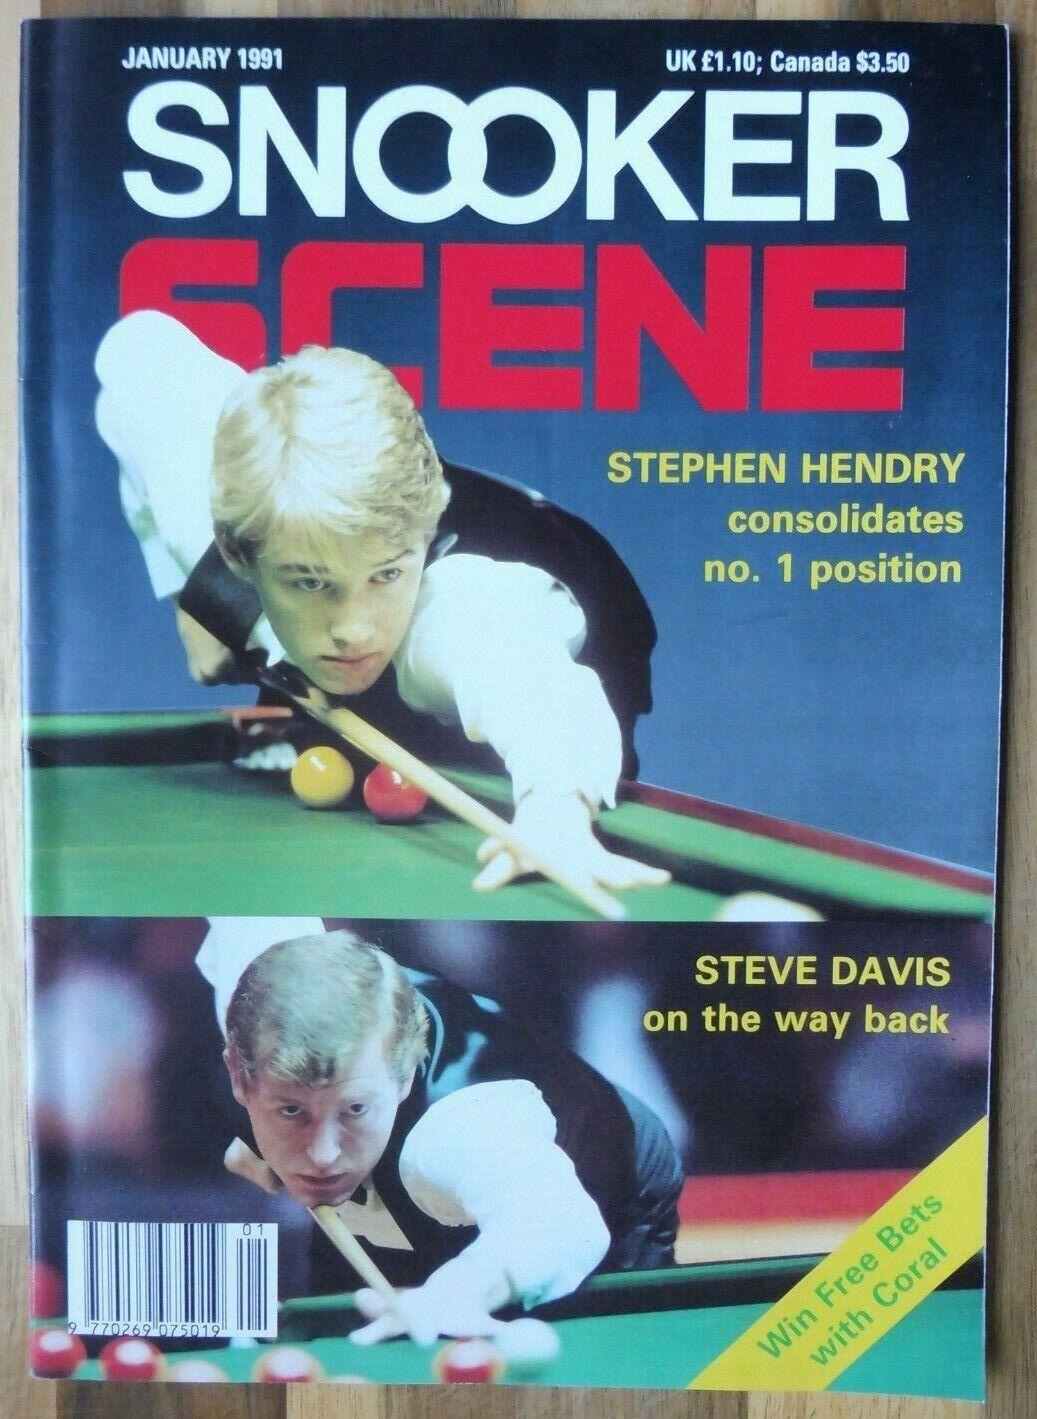 Snooker Scene Magazine, January 1991, Good Condition.